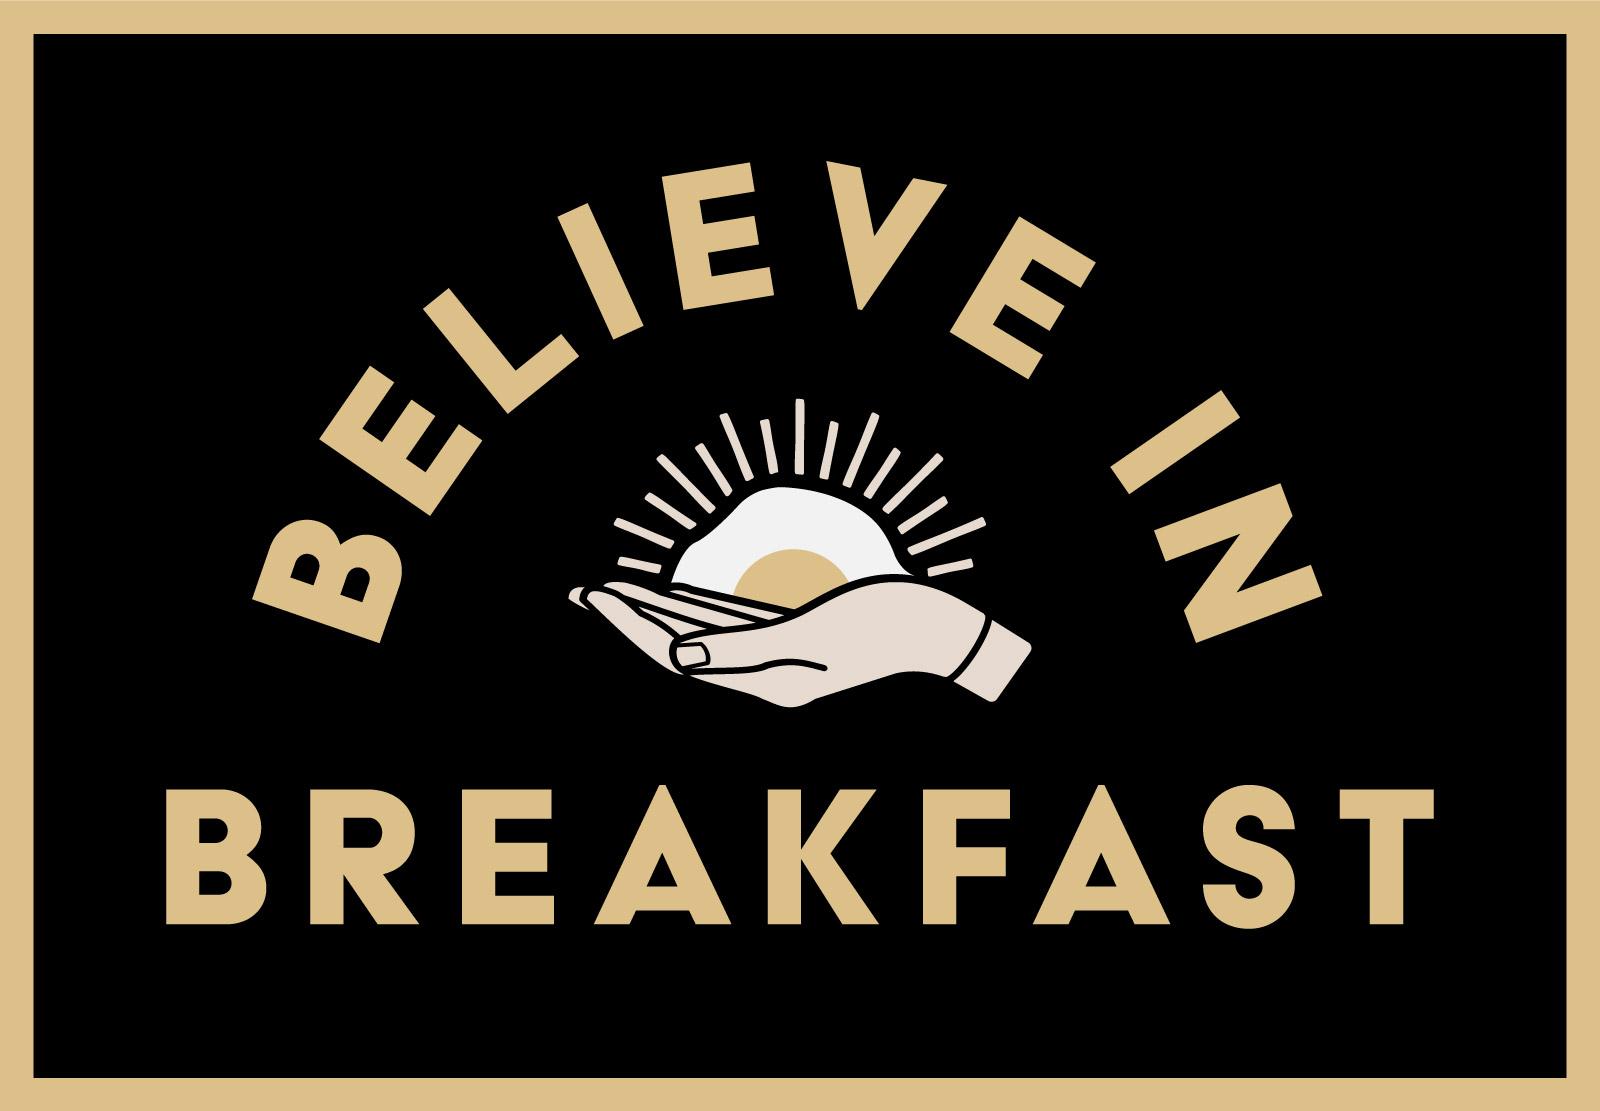 believeinbreakfastbanner.jpg